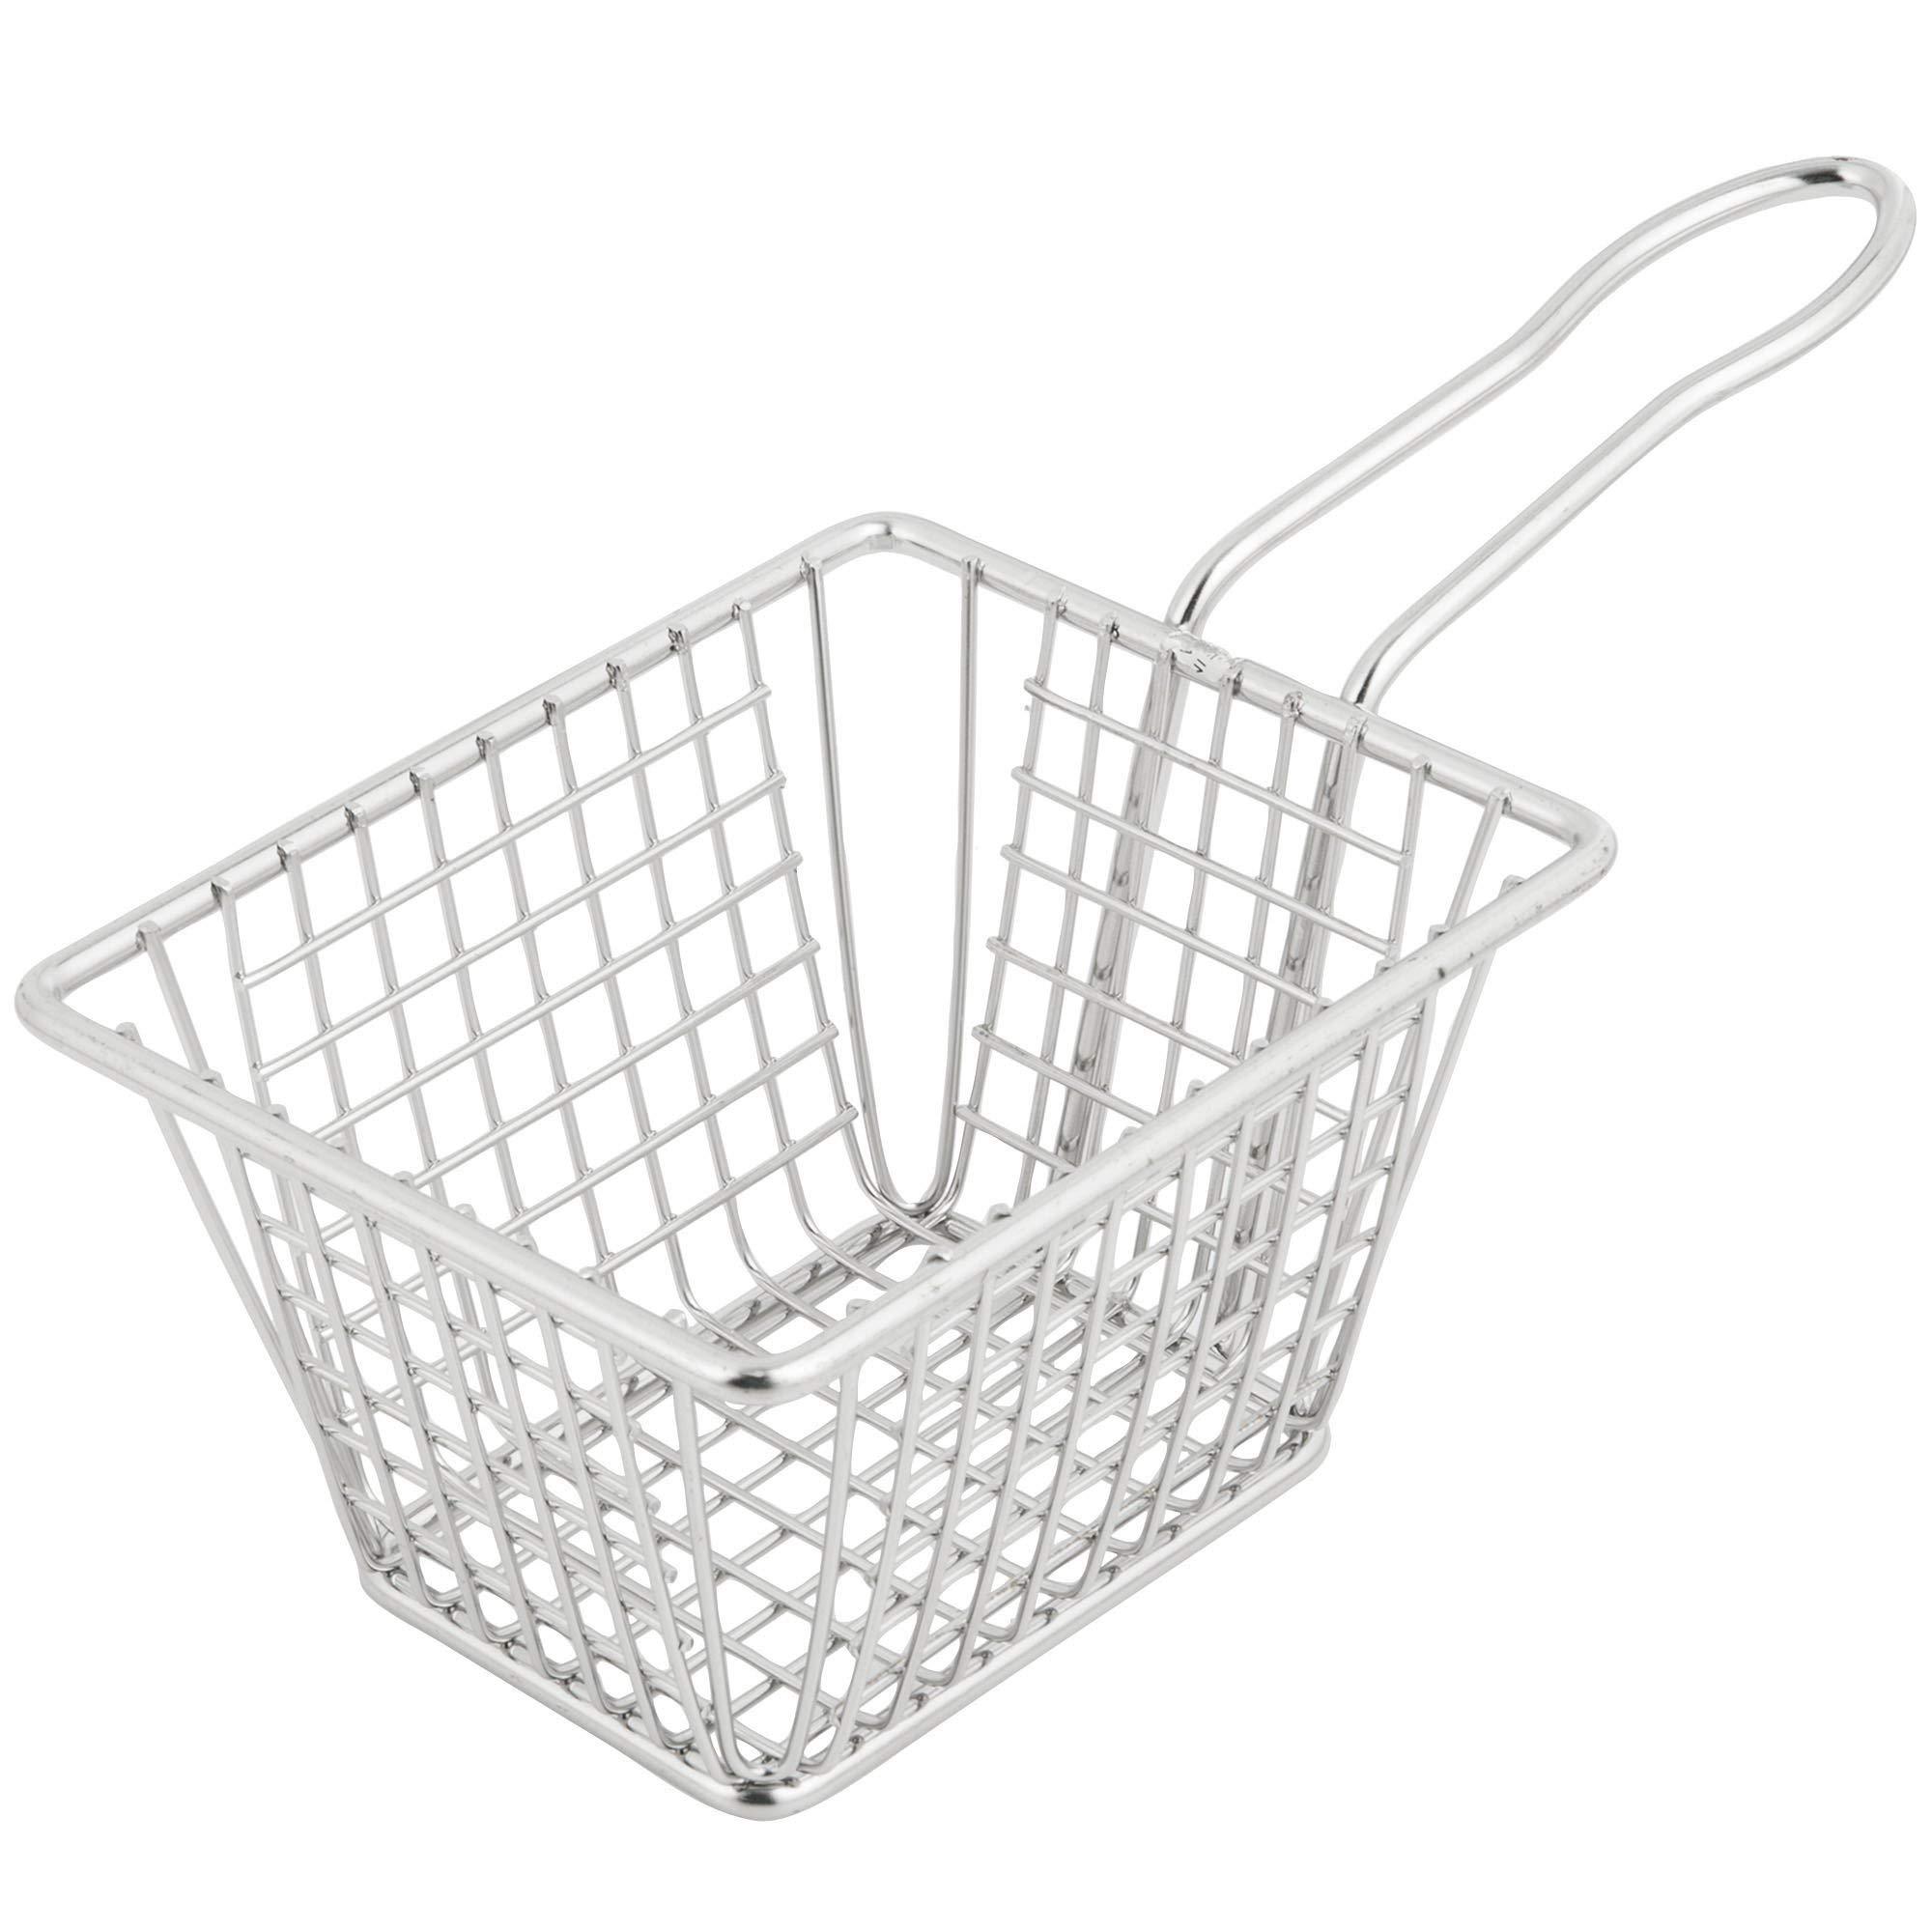 TableTop King 5'' x 4'' x 3'' Rectangular Stainless Steel Mini Fry Basket